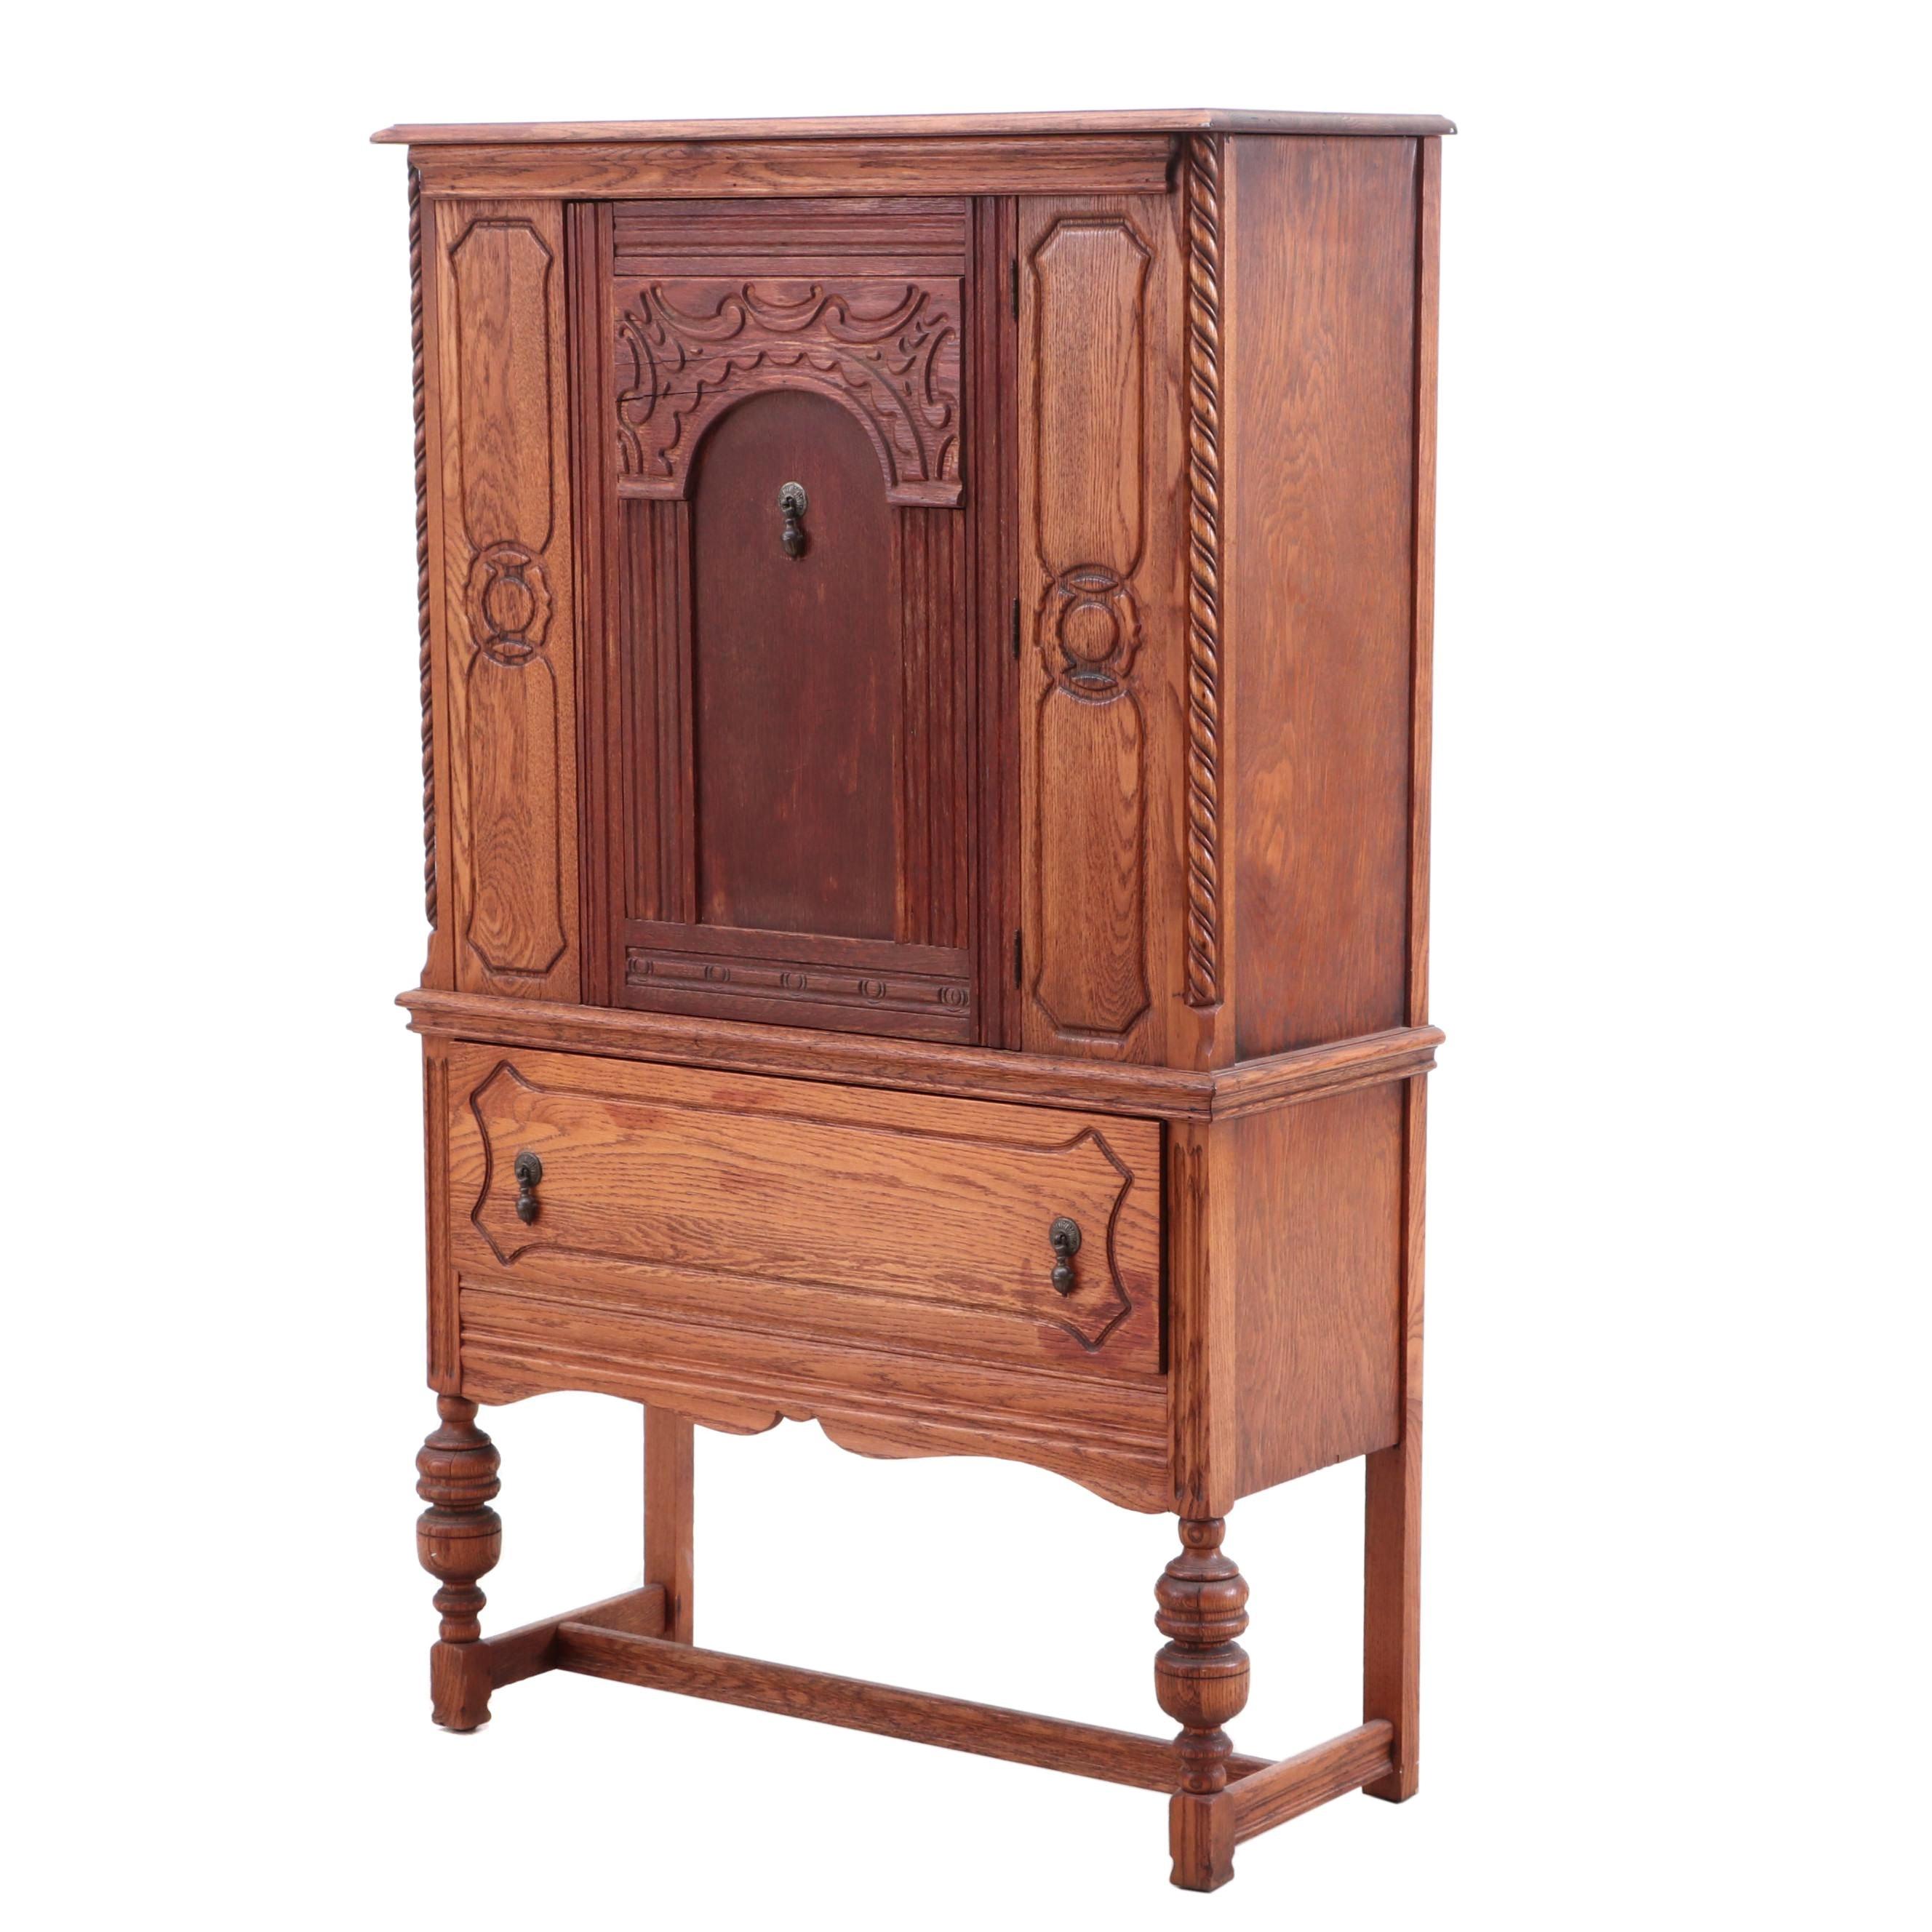 Tudor Style Oak China Cabinet, Circa 1920s